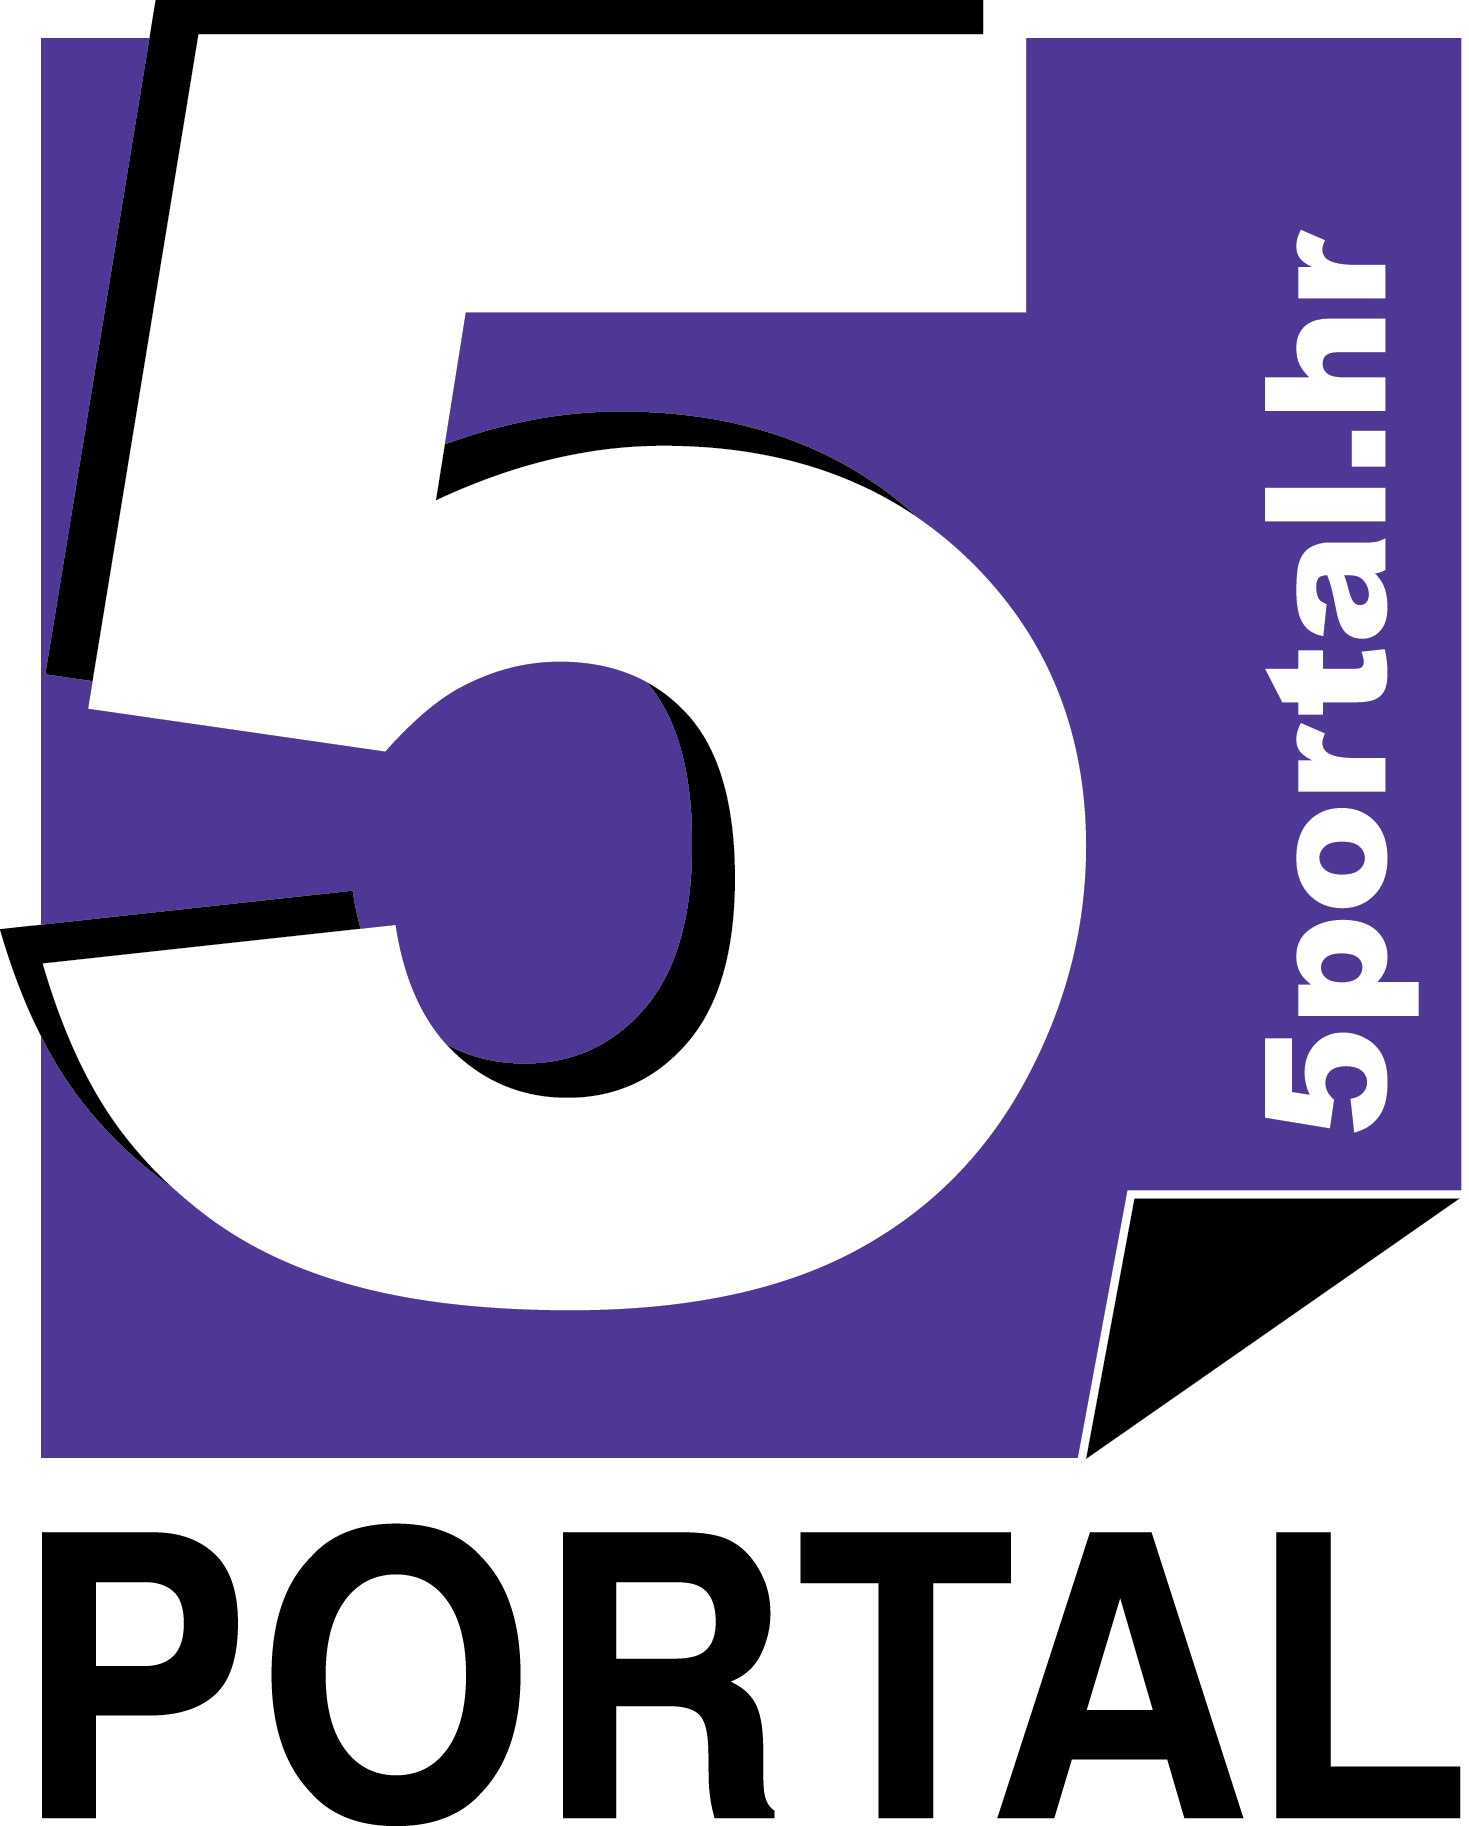 5portal